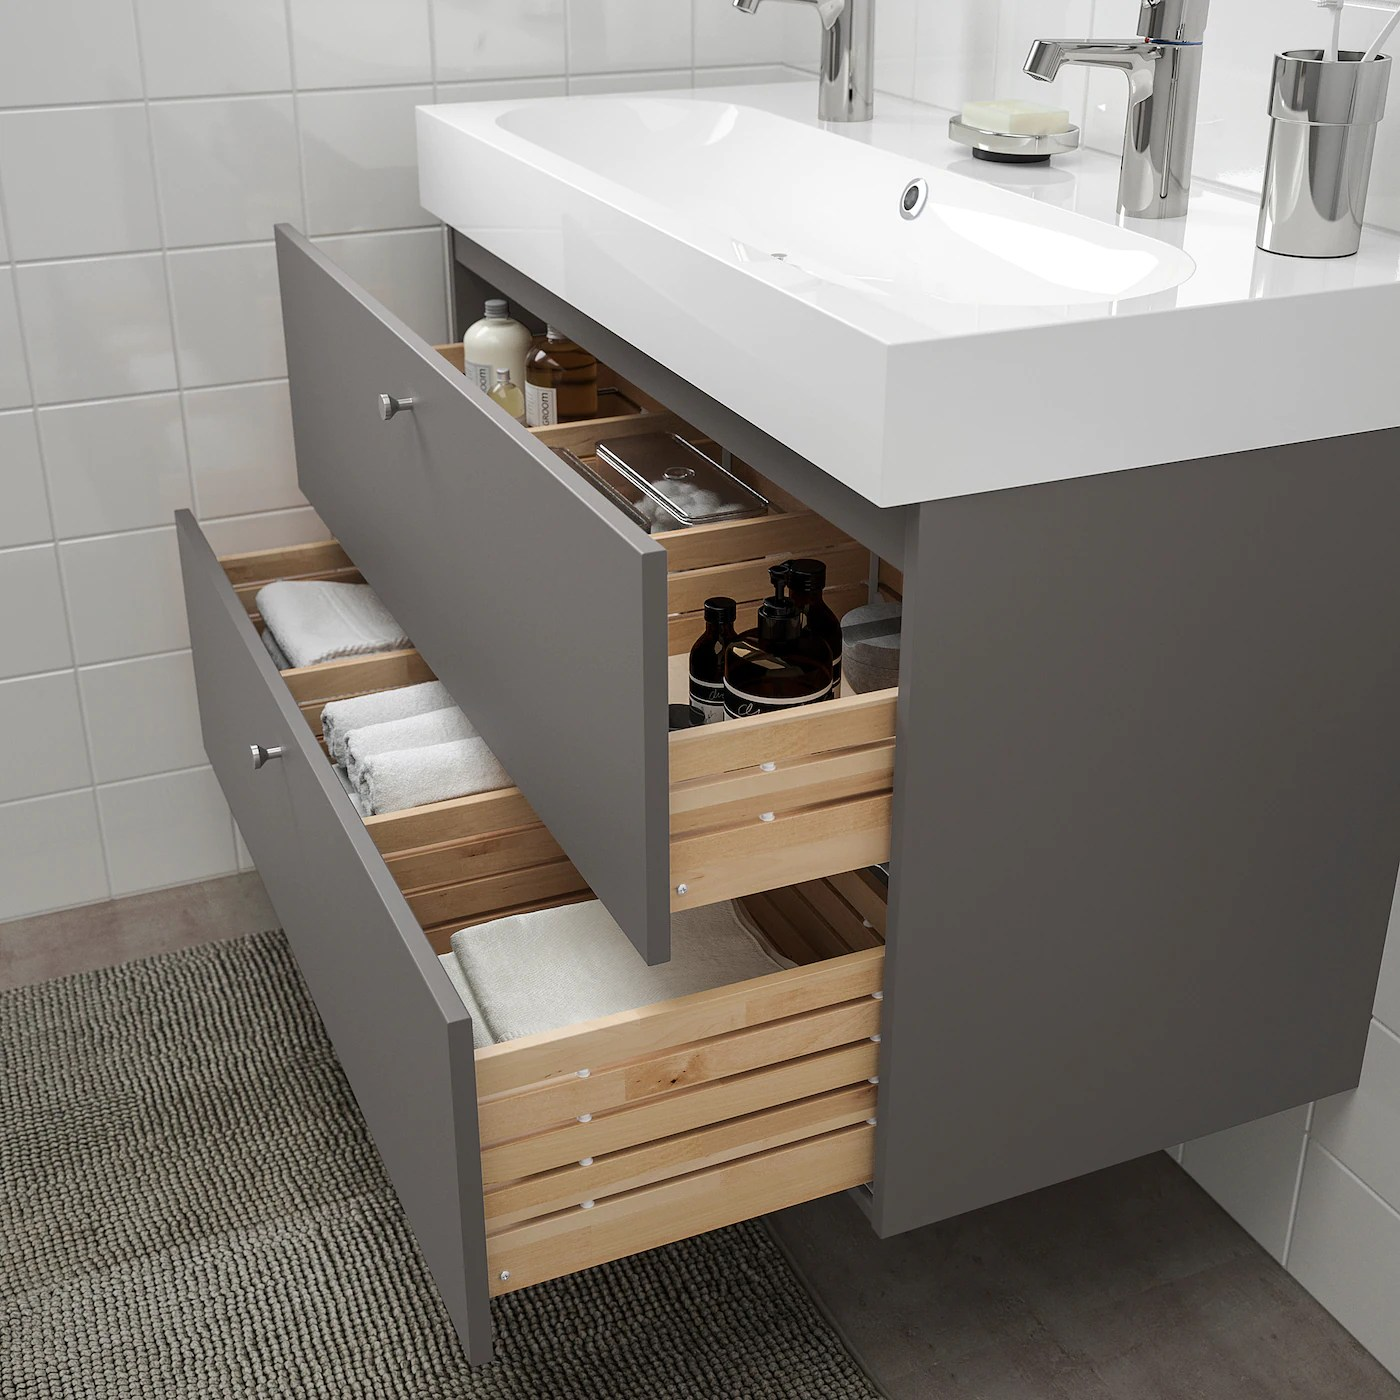 godmorgon bathroom vanity gillburen dark gray 39 3 8x18 1 2x22 7 8 100x47x58 cm